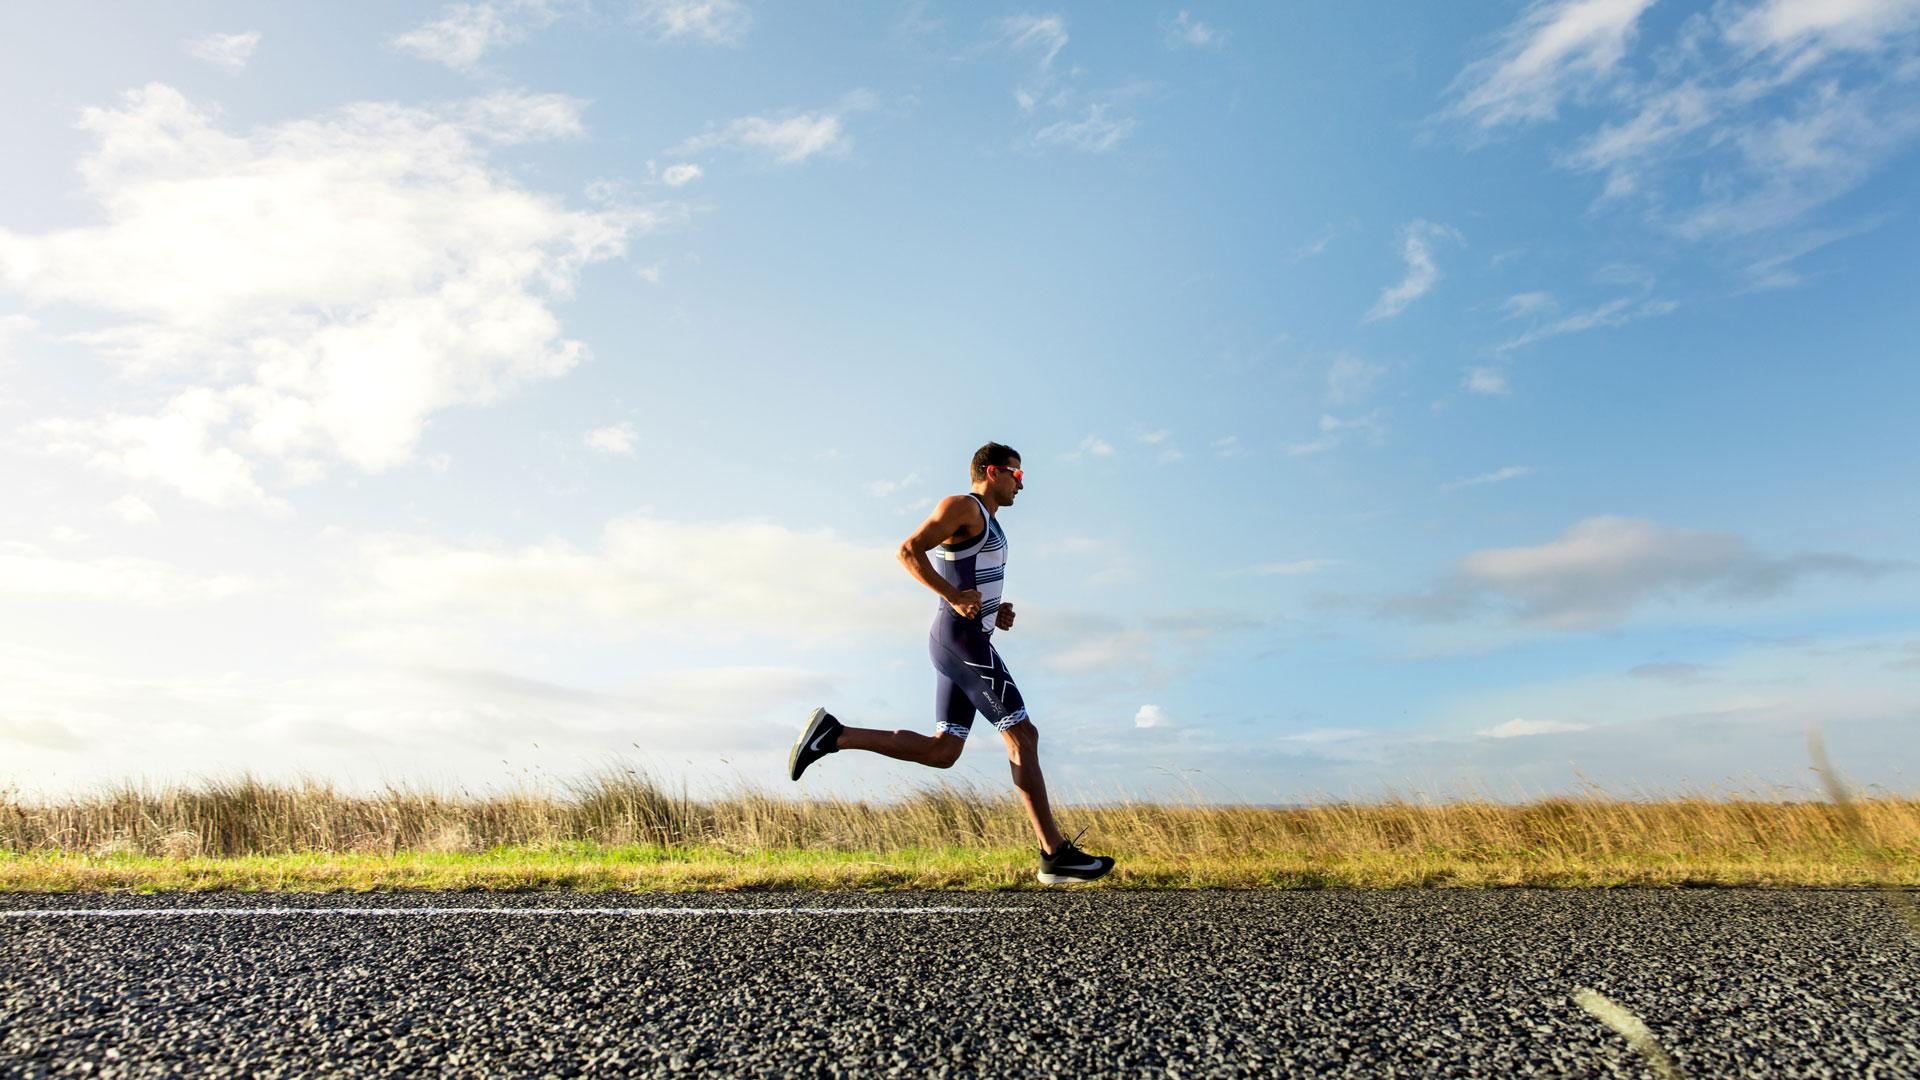 sports lifestyle photography